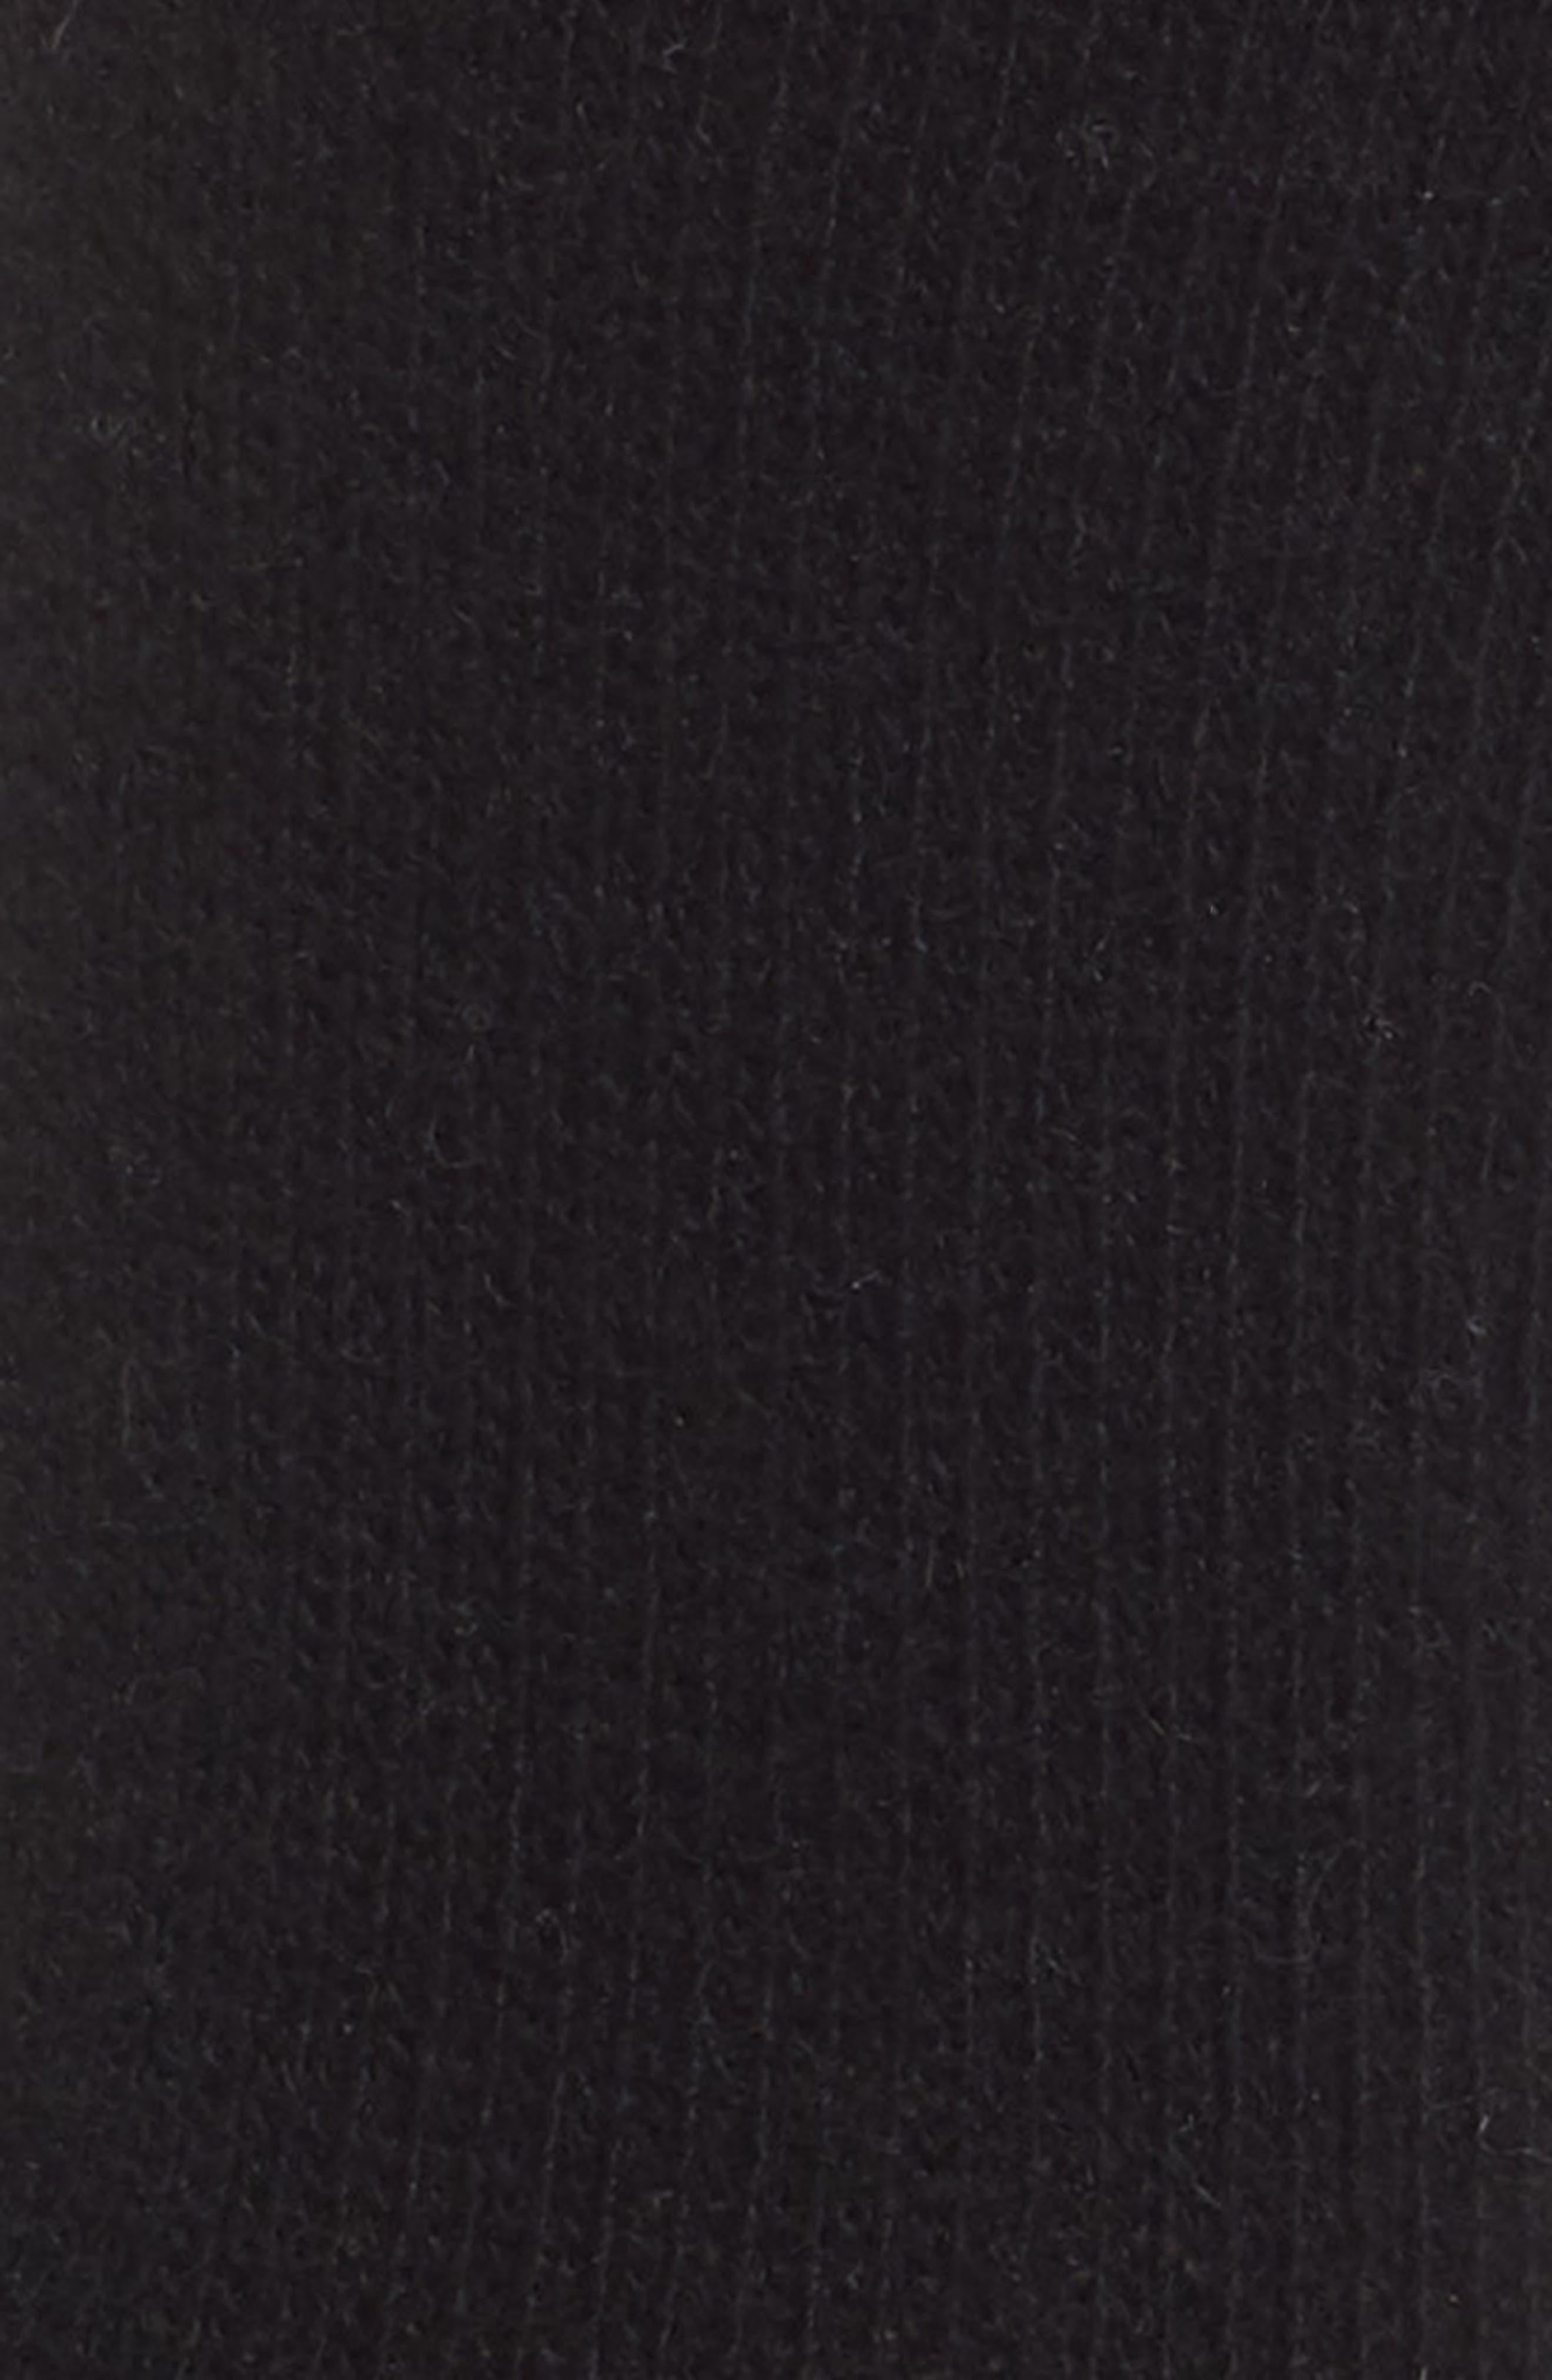 Cashmere Blend Crew Socks,                             Alternate thumbnail 2, color,                             BLACK